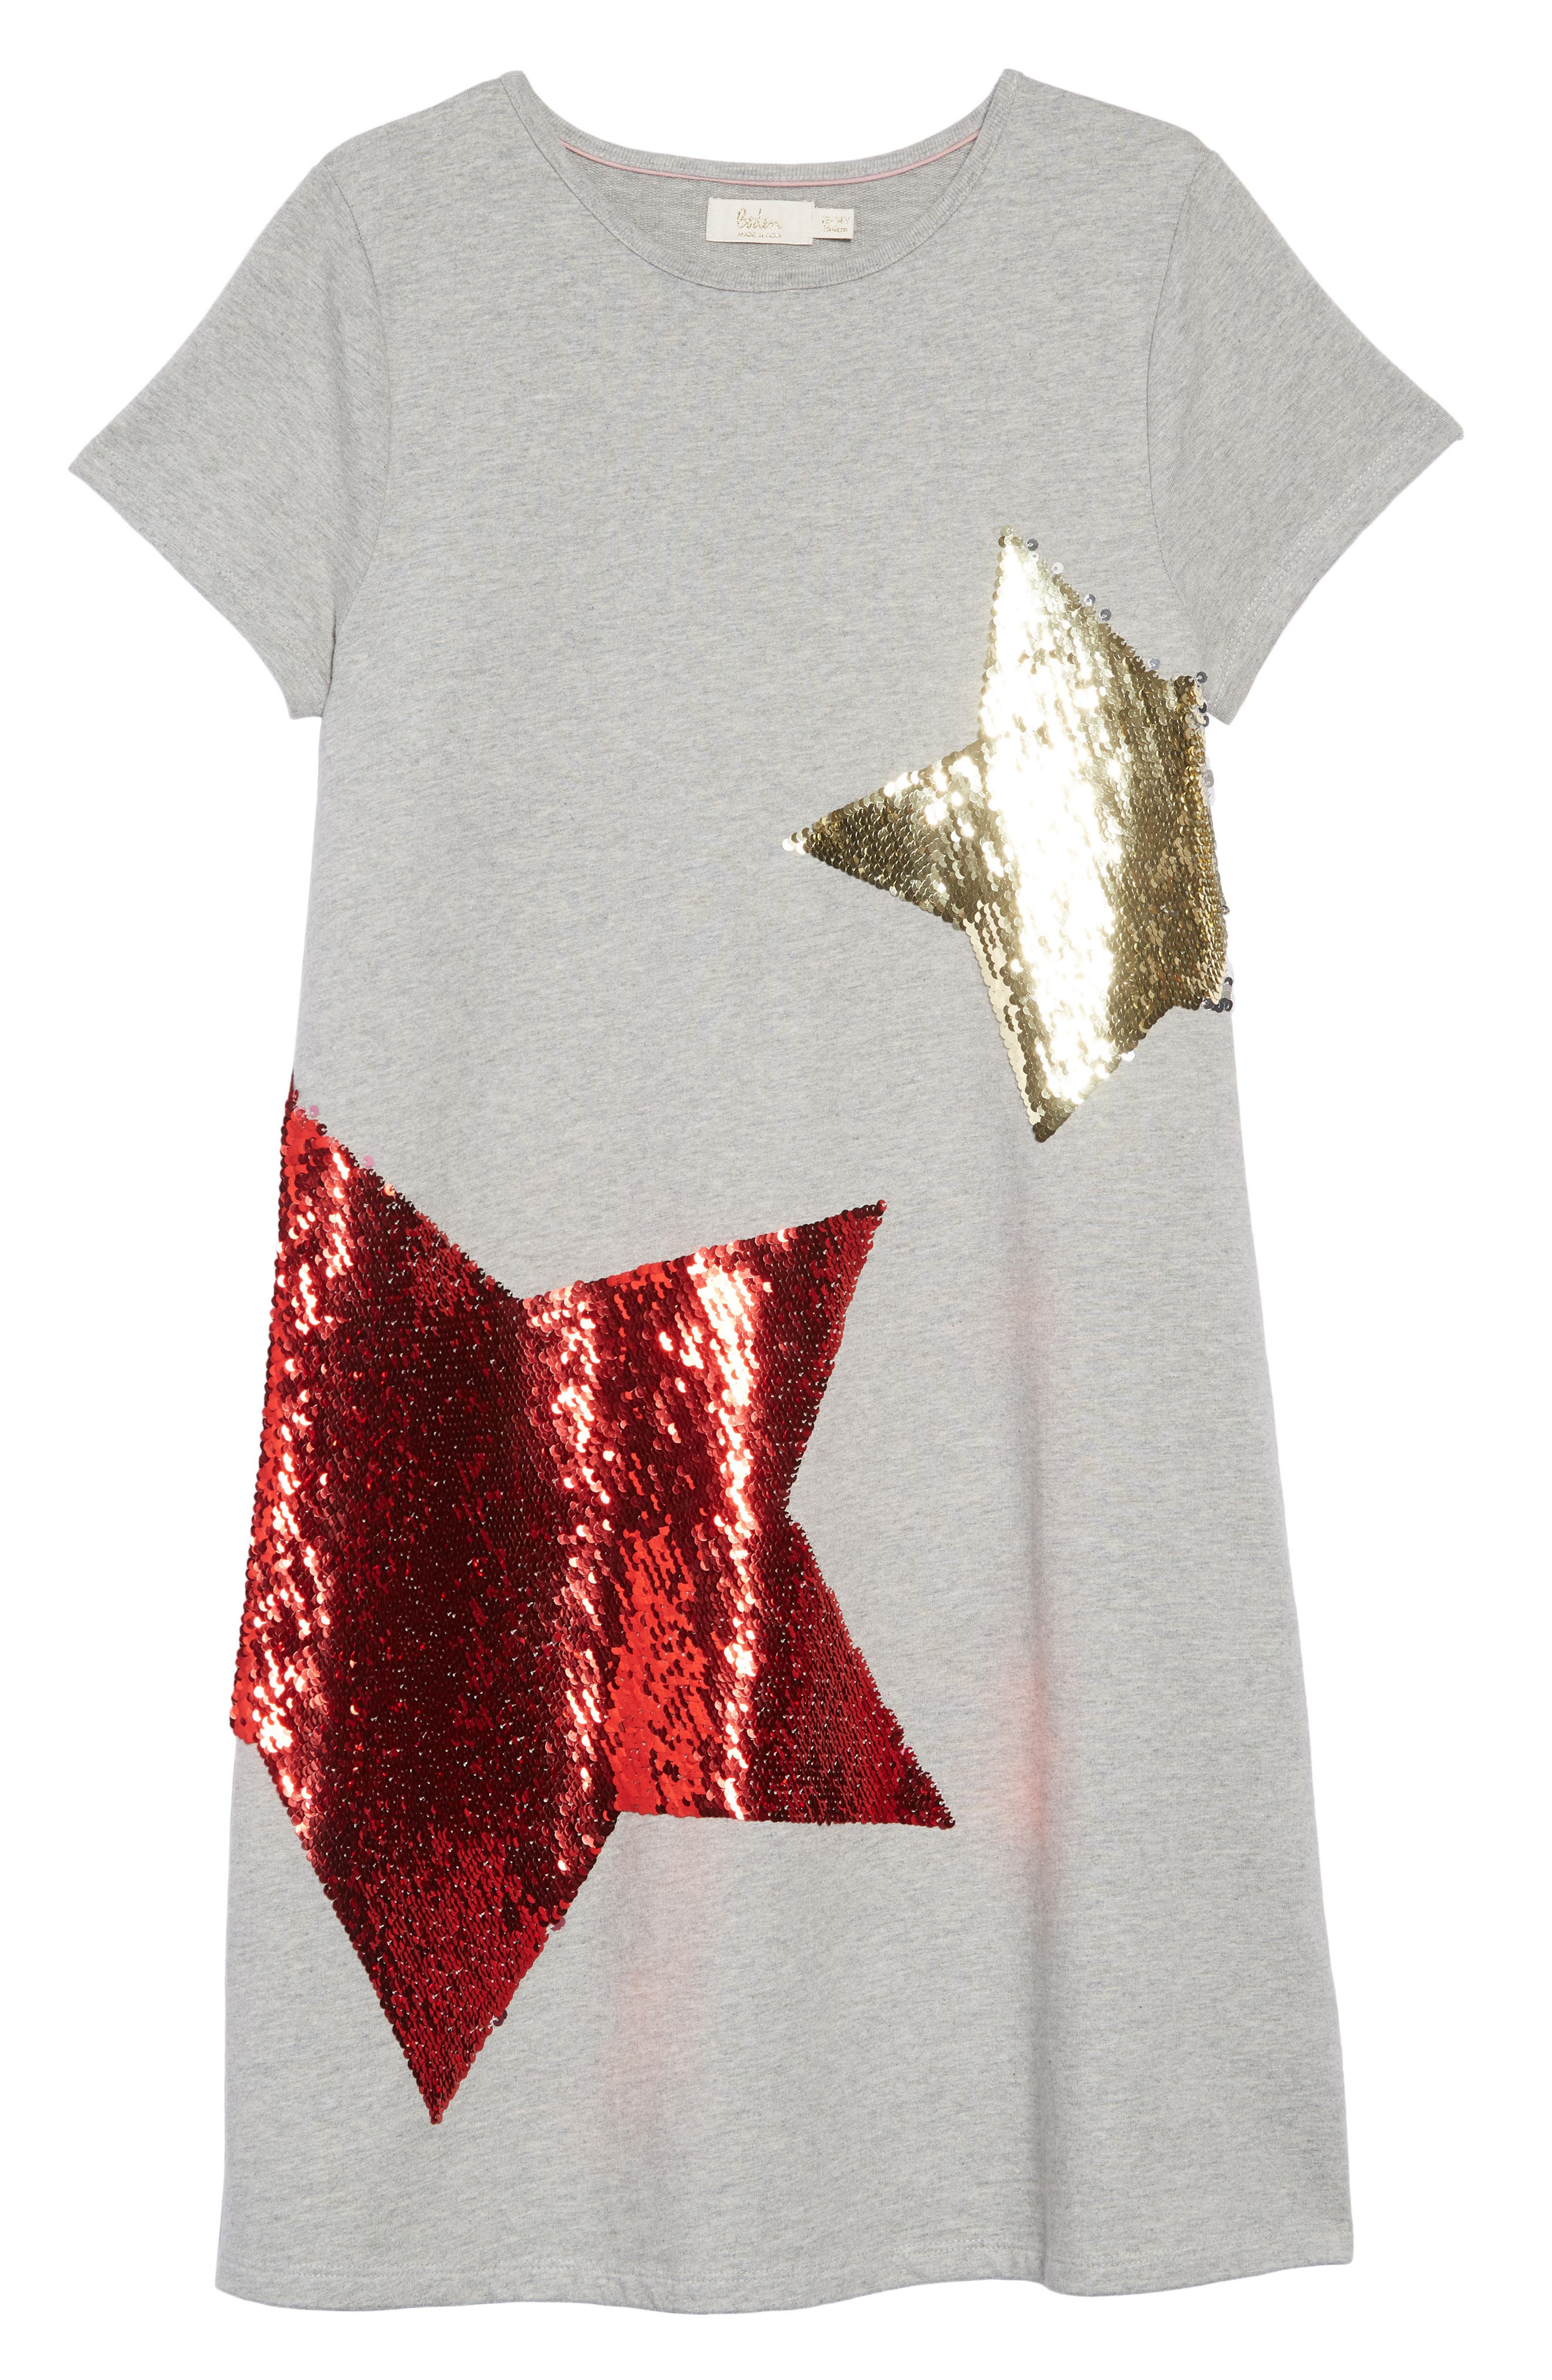 Shimmer Flip Sequin Star T-Shirt Dress,                             Alternate thumbnail 3, color,                             GRY GREY MARL/ RAINBOW SEQUINS